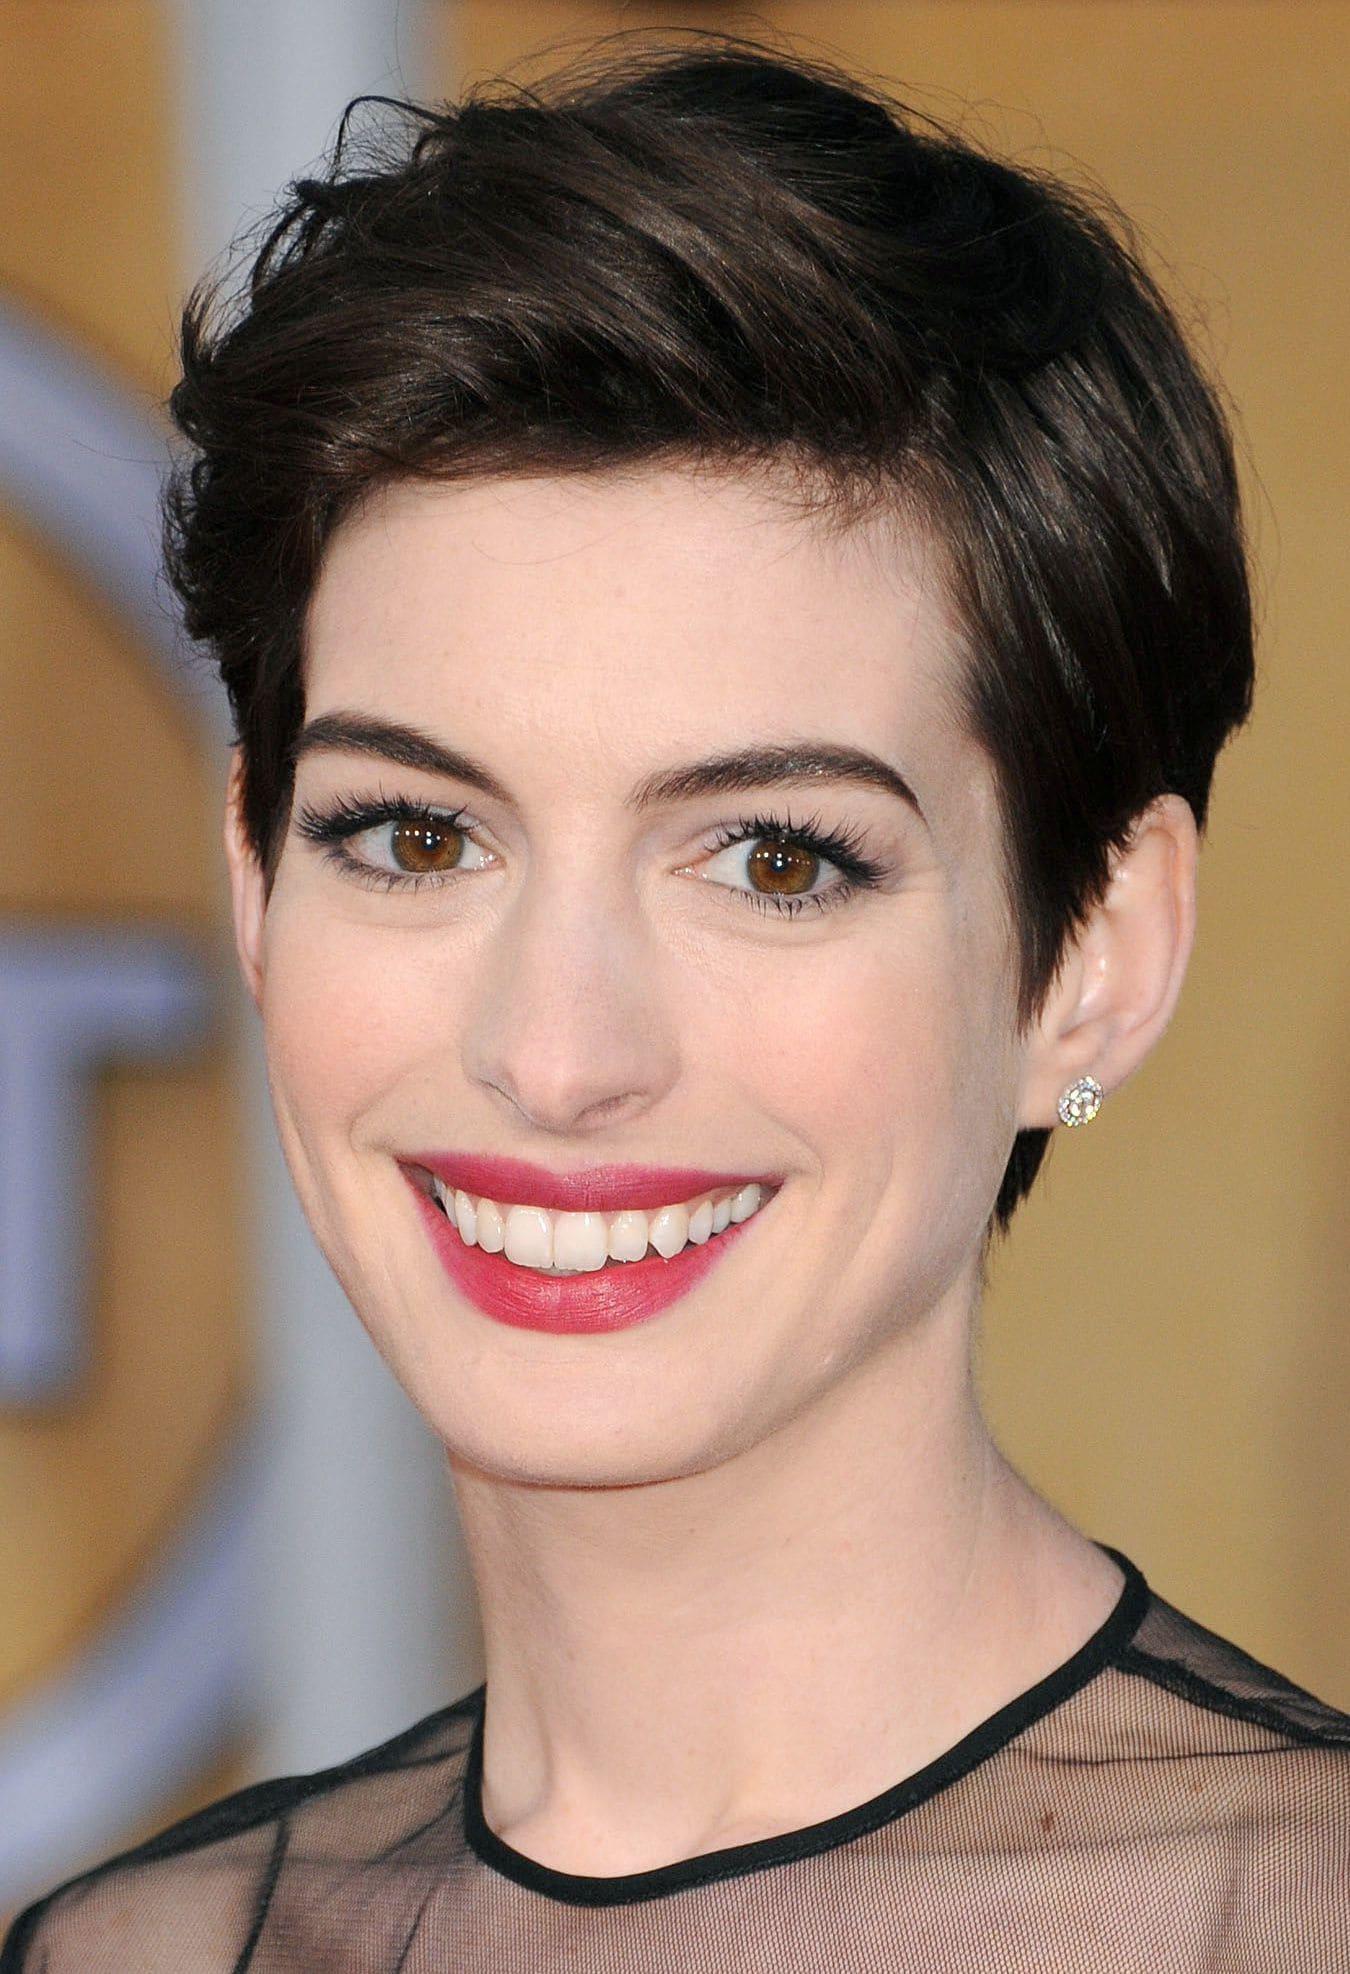 Anne Hathaway - 2013 - Brown pixie cut - Rex